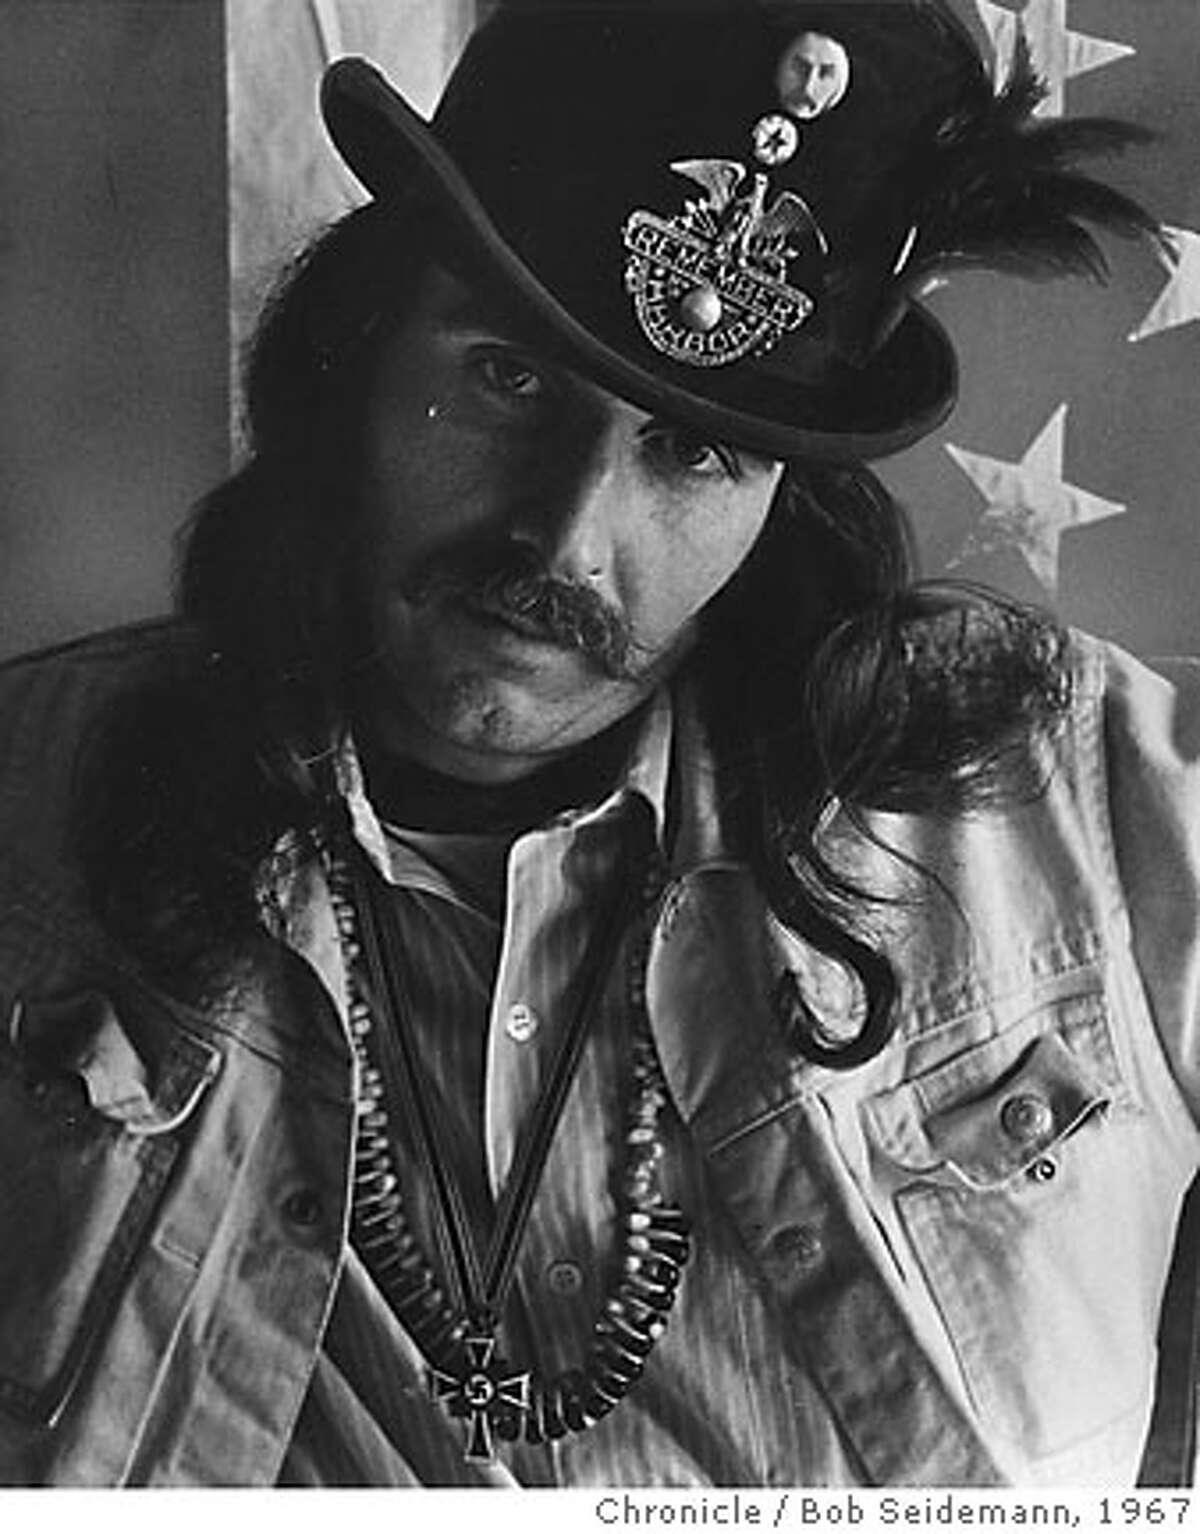 Alton Kelly -- Sun Jul 16, 1967